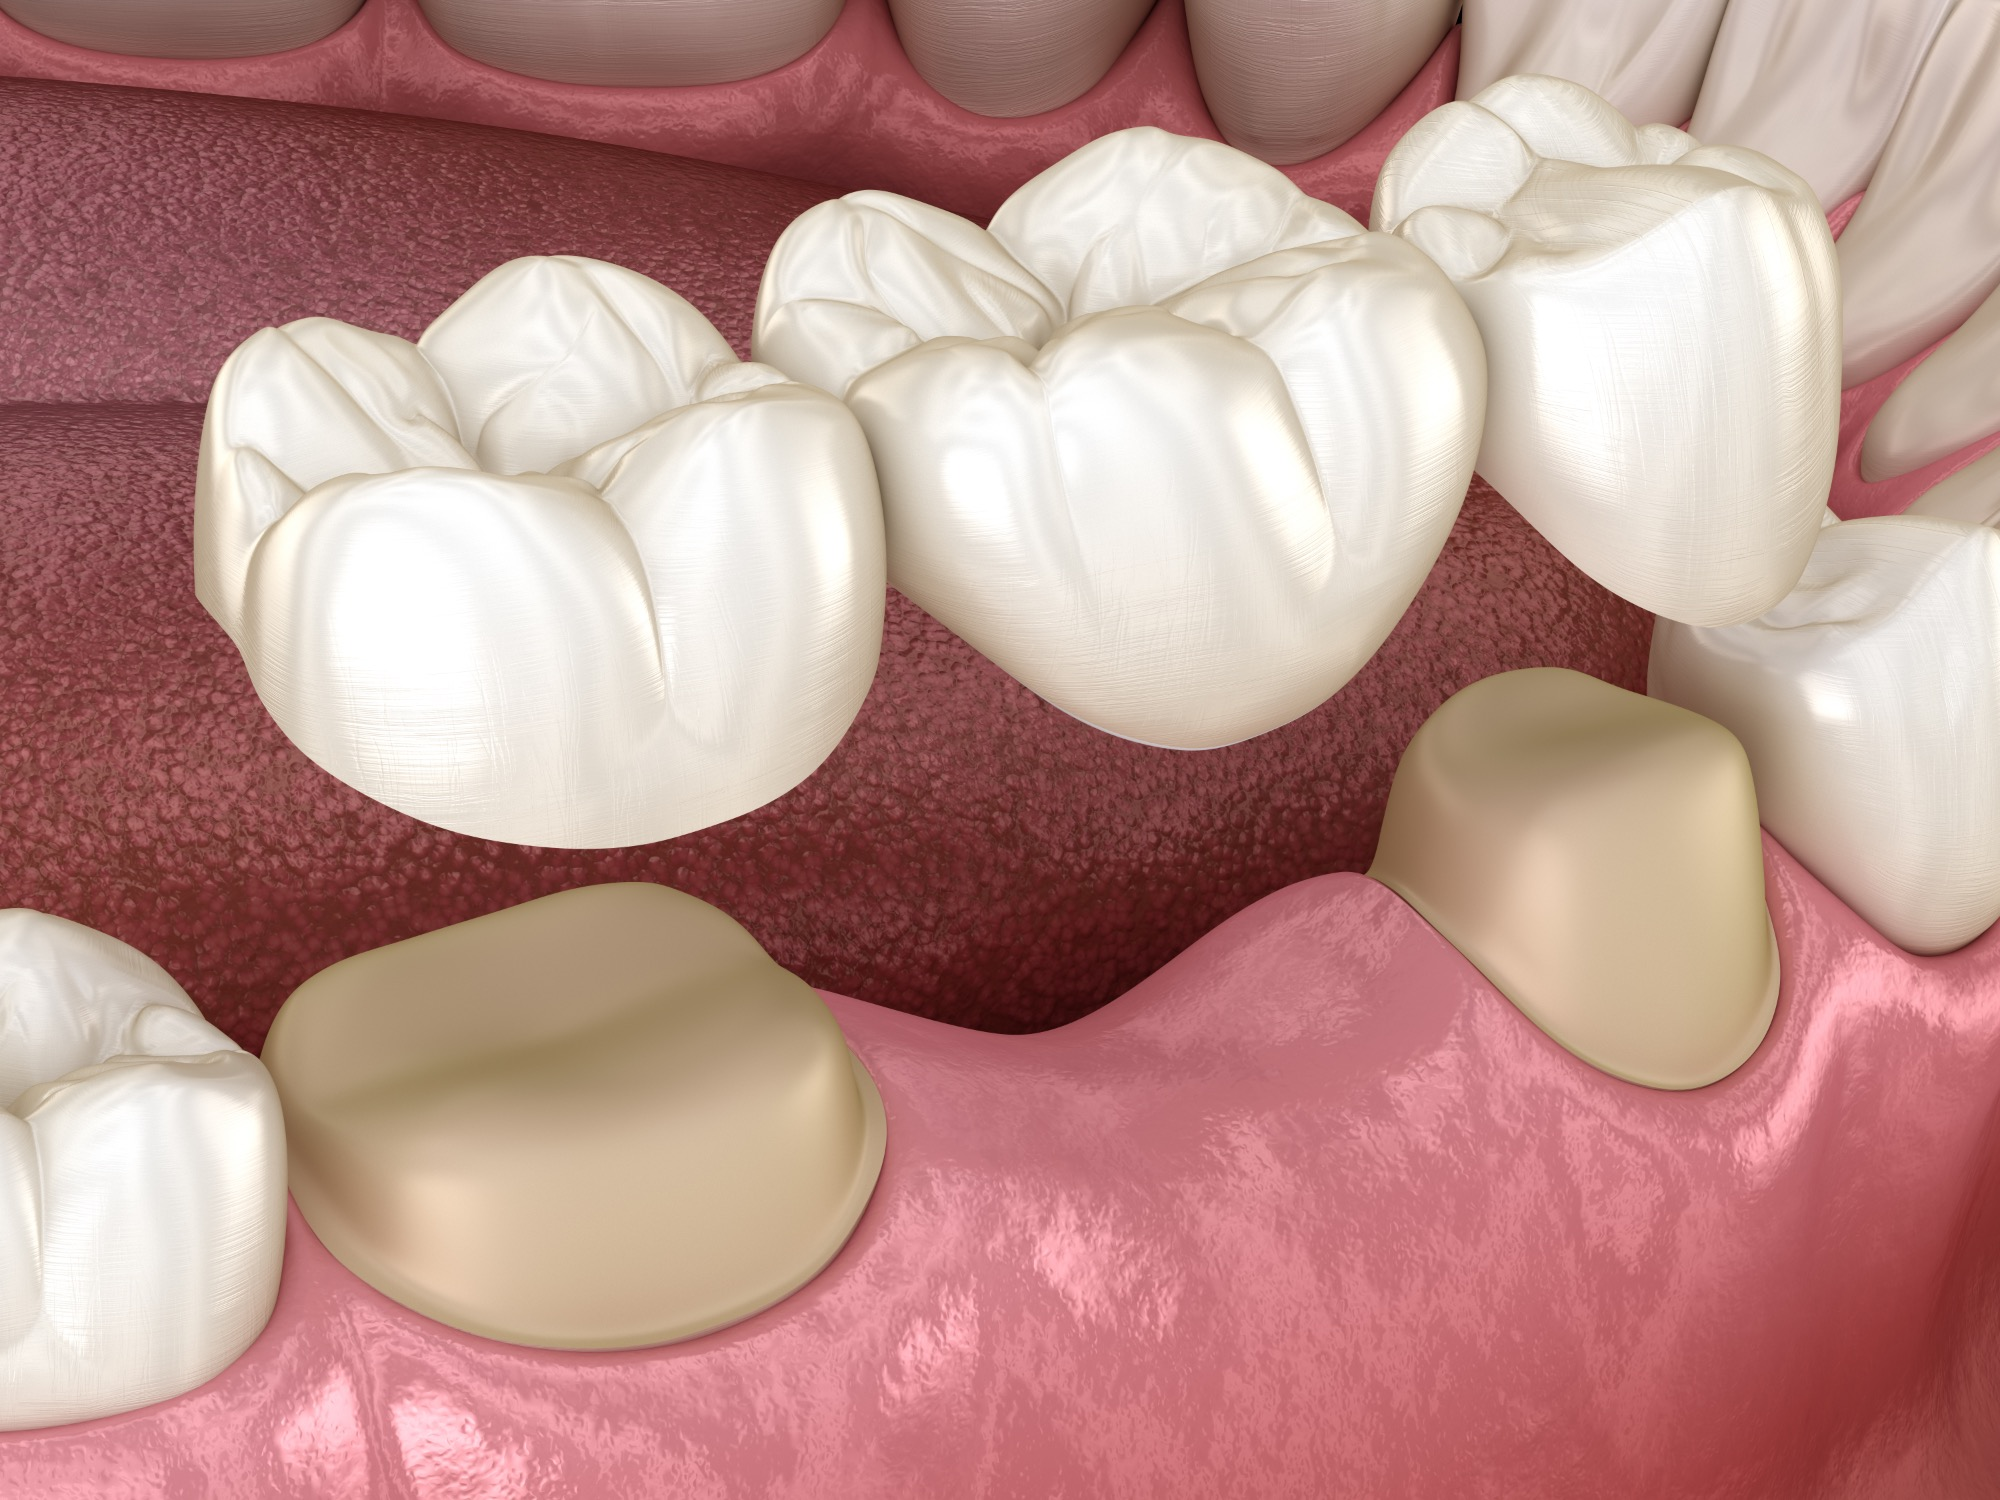 Dental,Bridge,Of,3,Teeth,Over,Molar,And,Premolar.,Medically